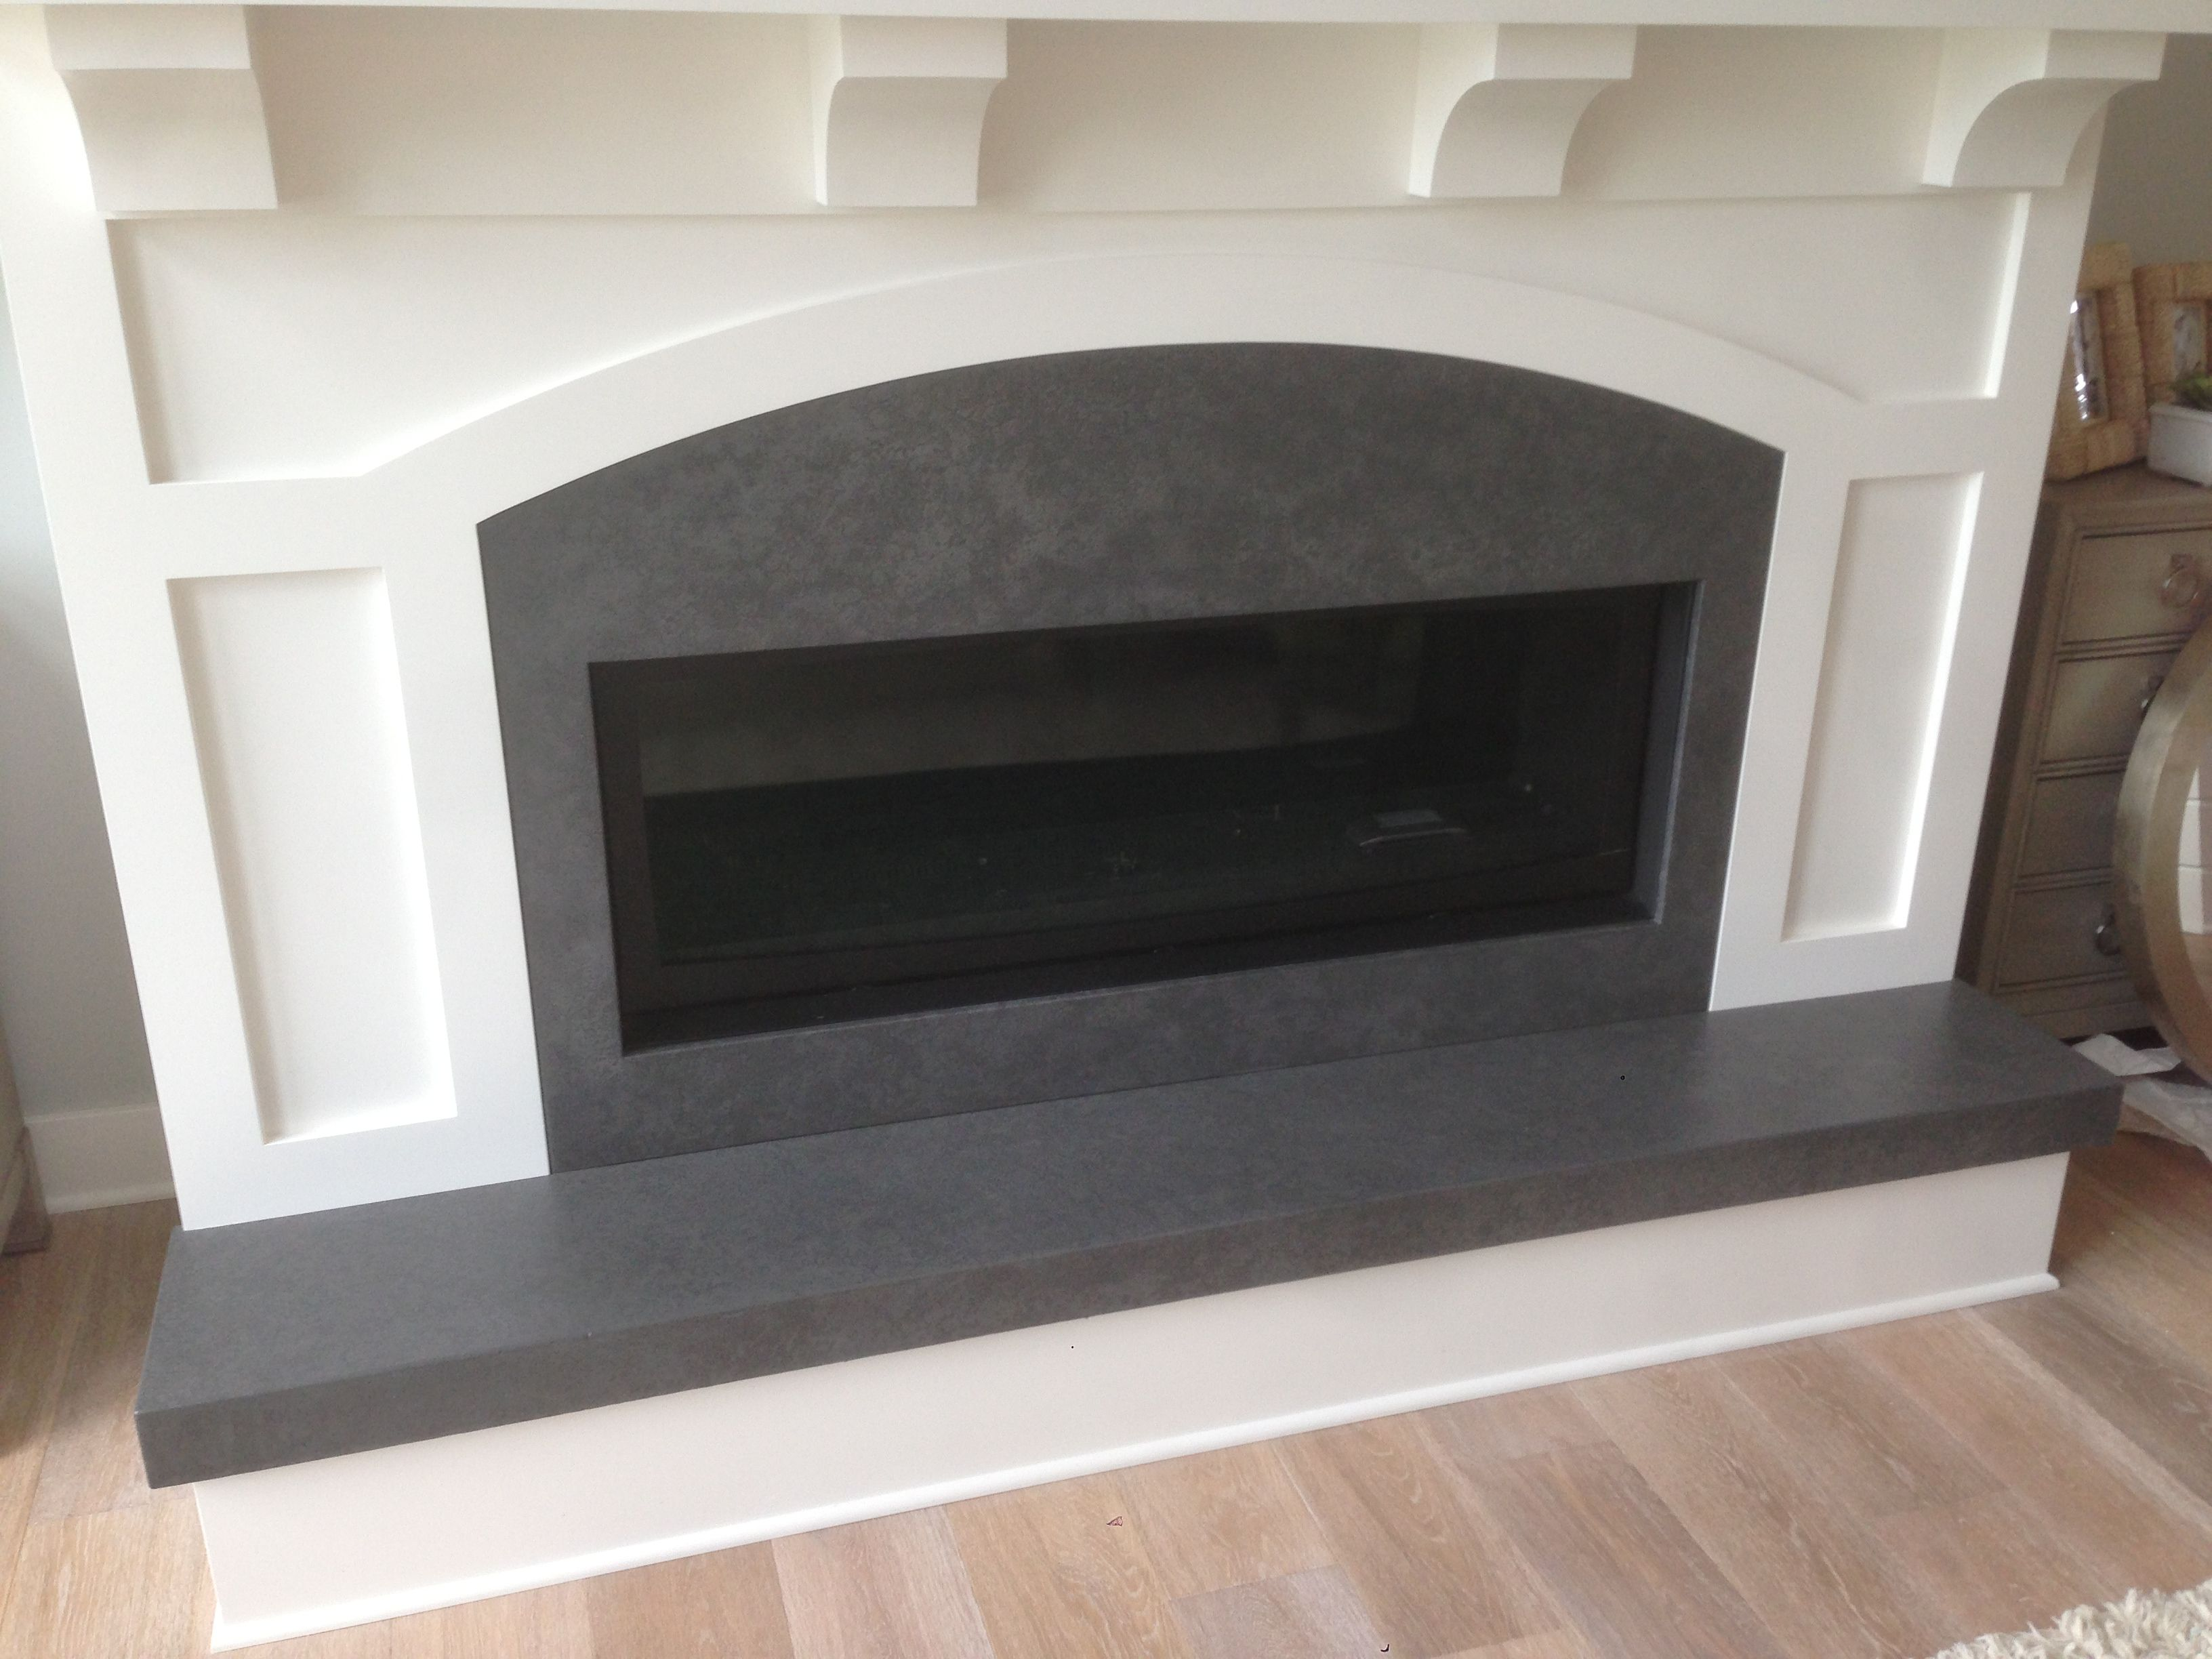 Hard Topix Concrete Fireplace Surrounds Hearths And Mantles Grand Rapids Mi Cast Stone Fireplace Stone Fireplace Fireplace